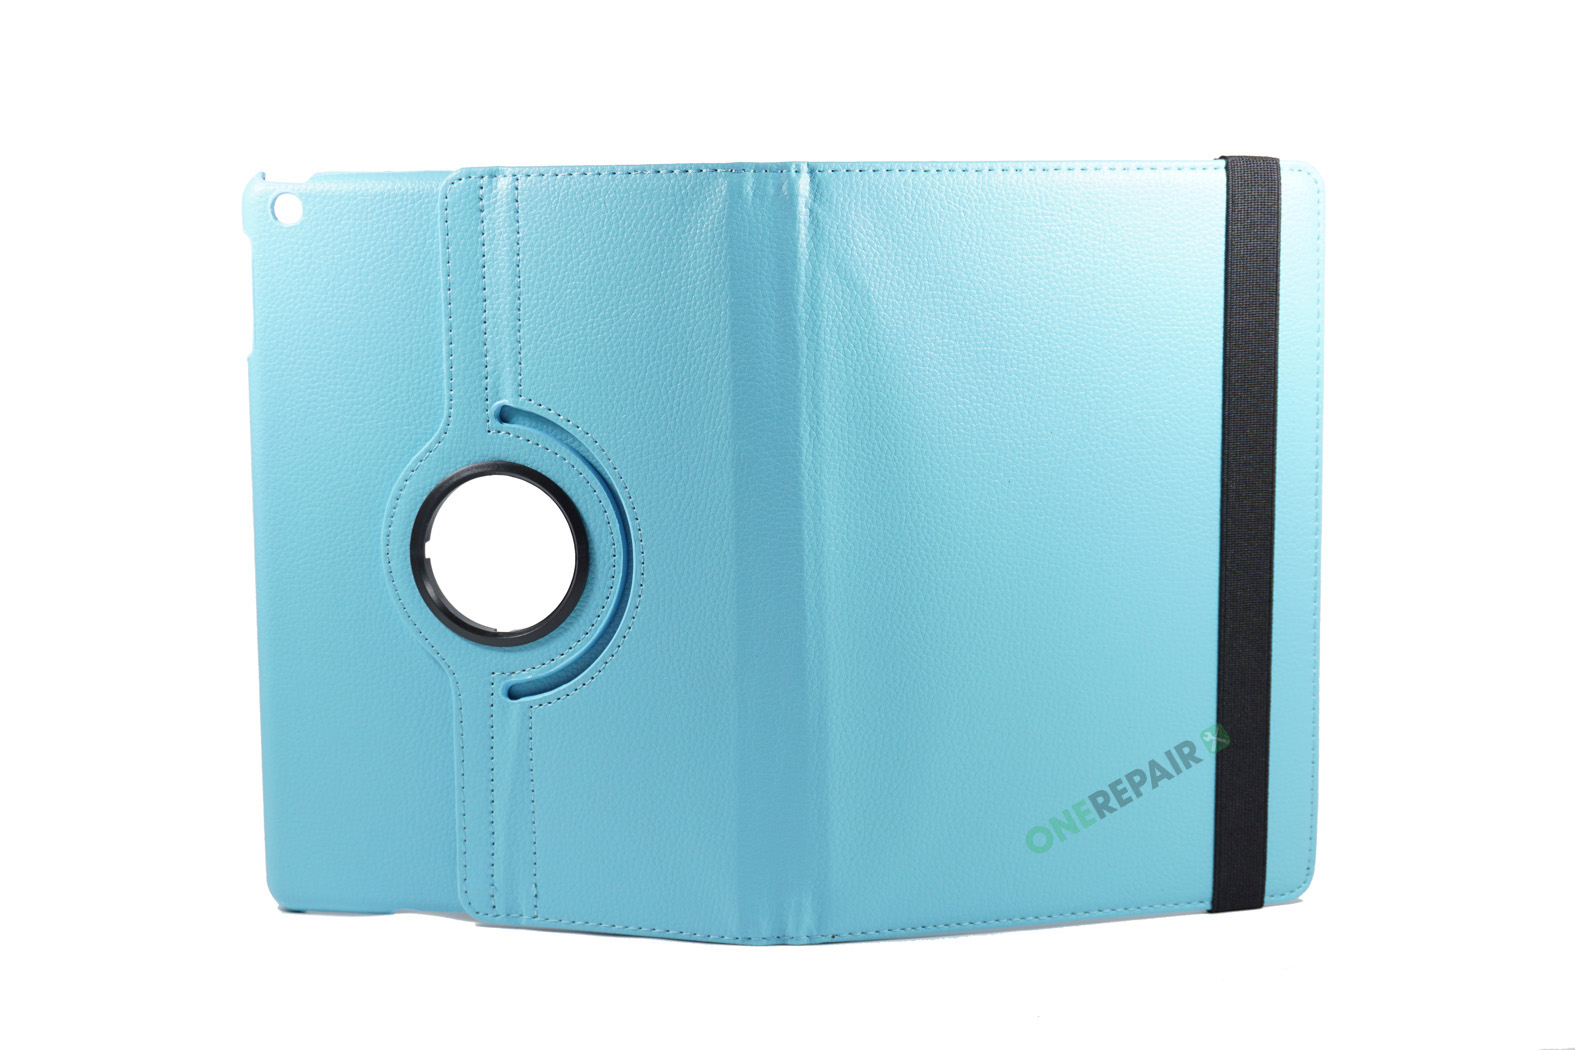 351054_iPad_Air2_2_A1566_A1567_Flipcover_Cover_Lyseblaa_Blaa_OneRepair_00004